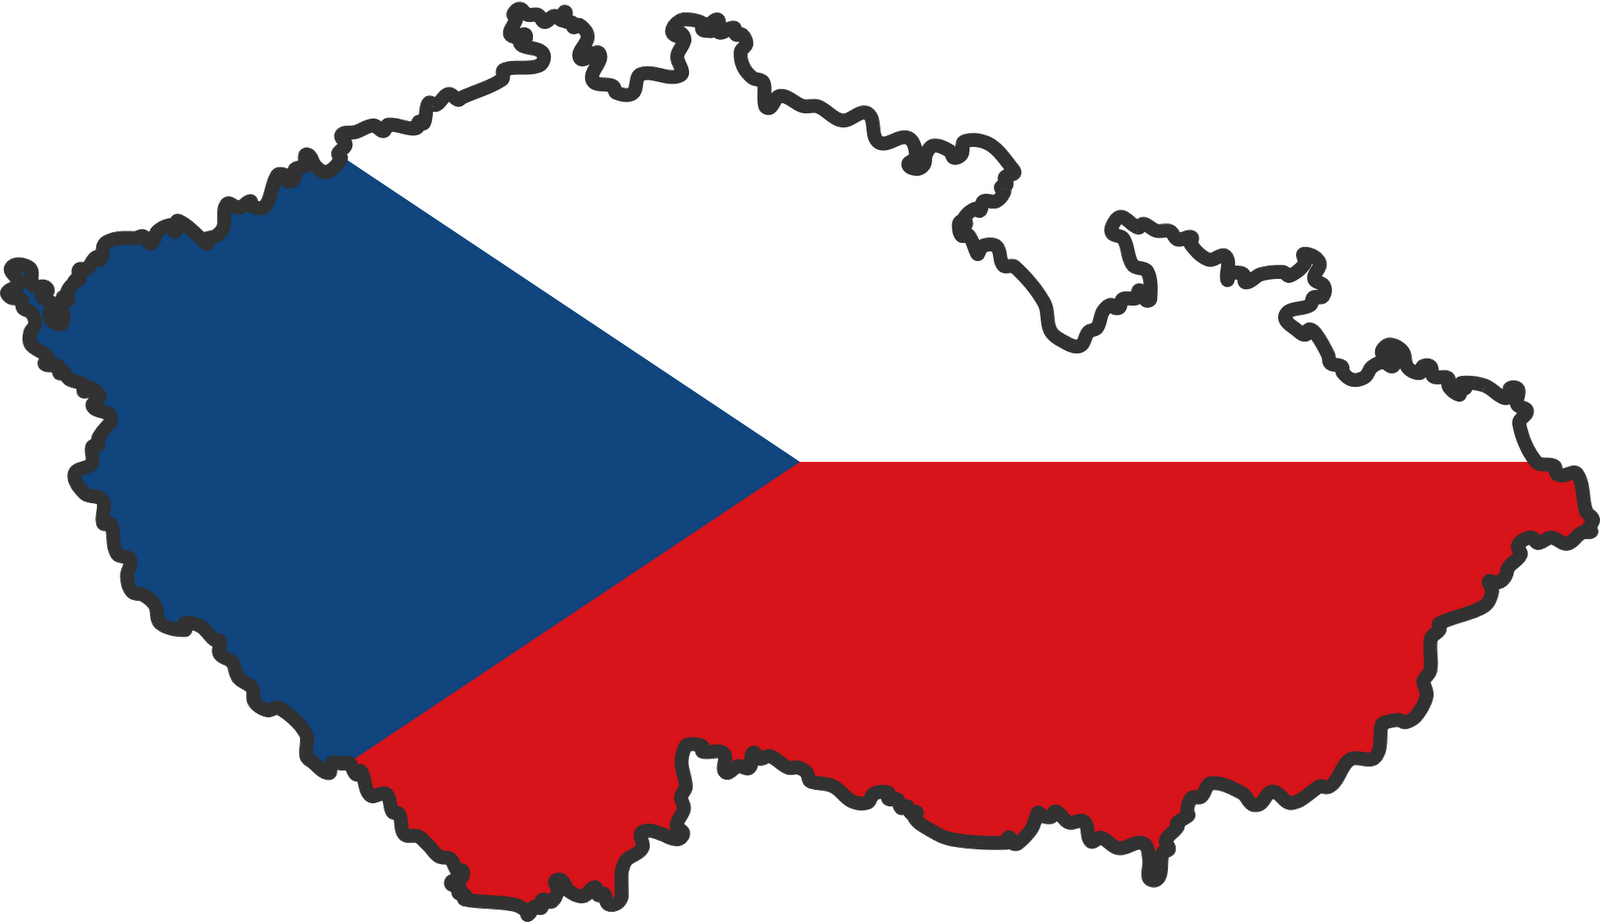 Pills clipart anabolic steroid. Czechoslovakia czech gang selling